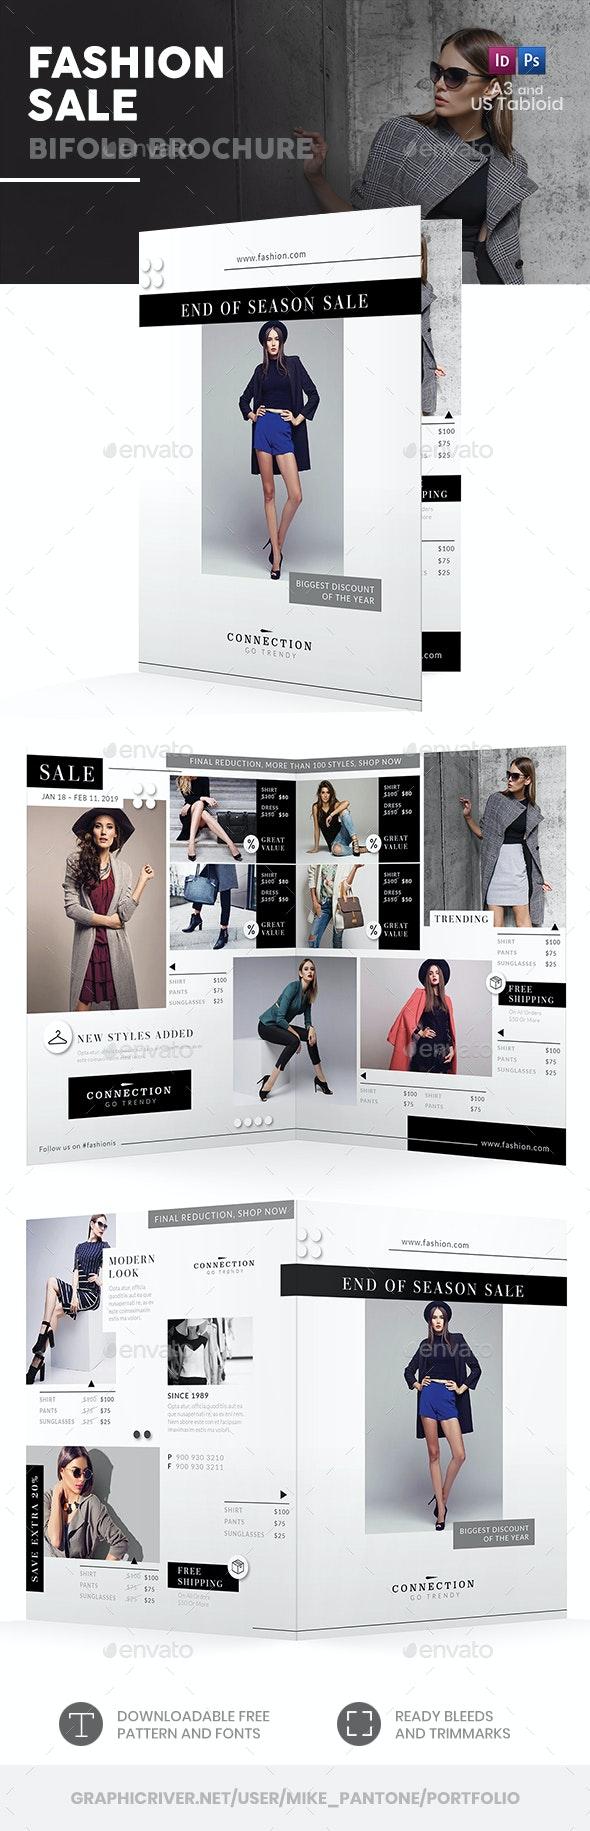 Fashion Shop Sale Bifold / Halffold Brochure - Informational Brochures